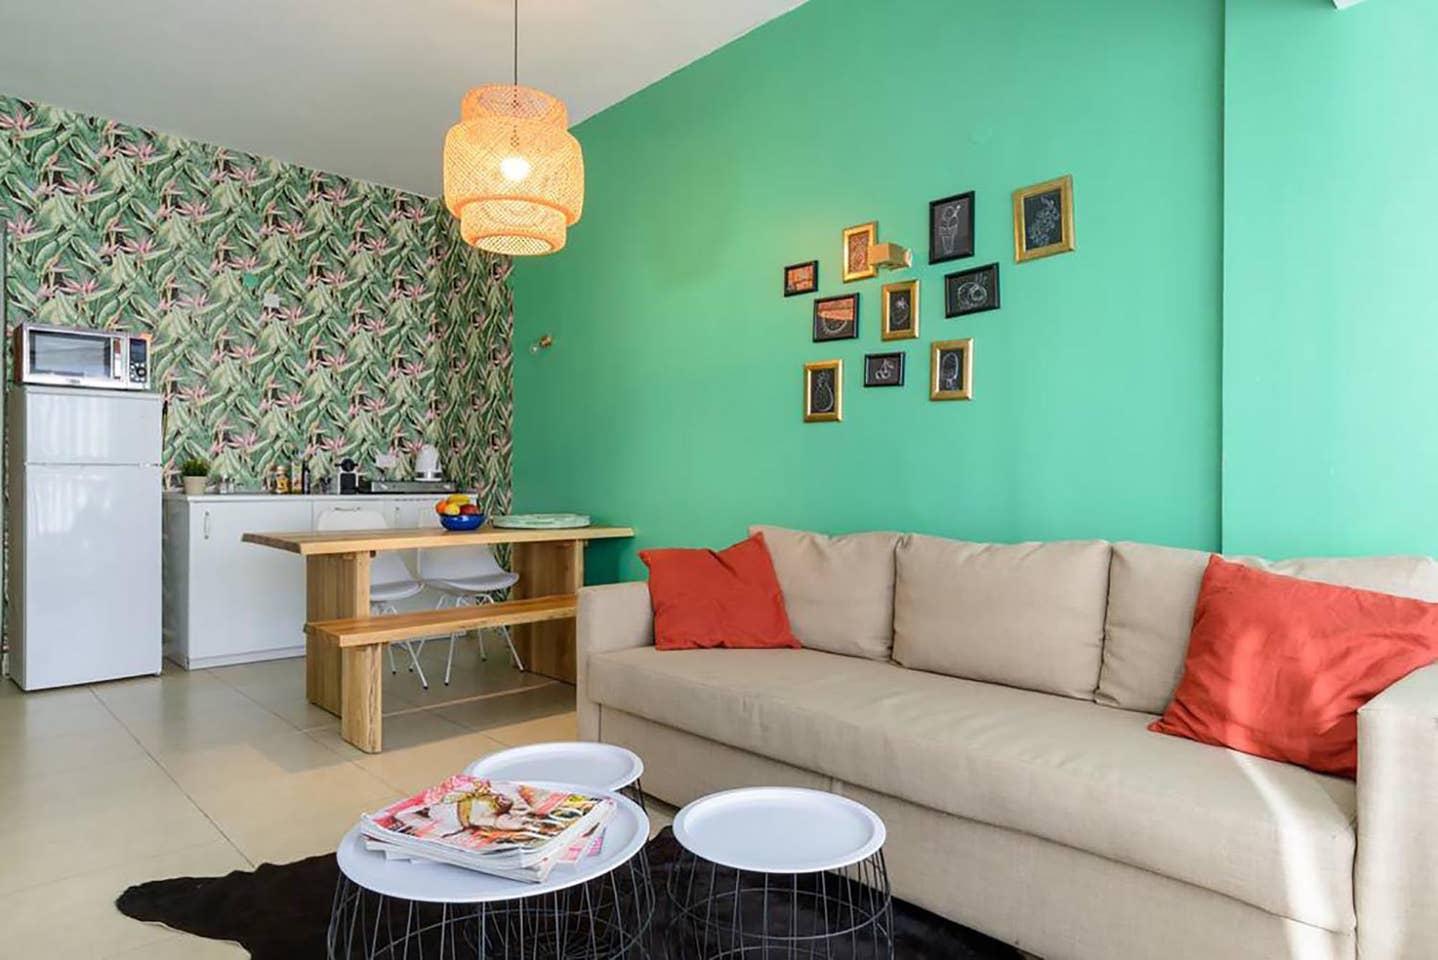 Apartment Tropical sensation next to the beach TLV photo 18418324